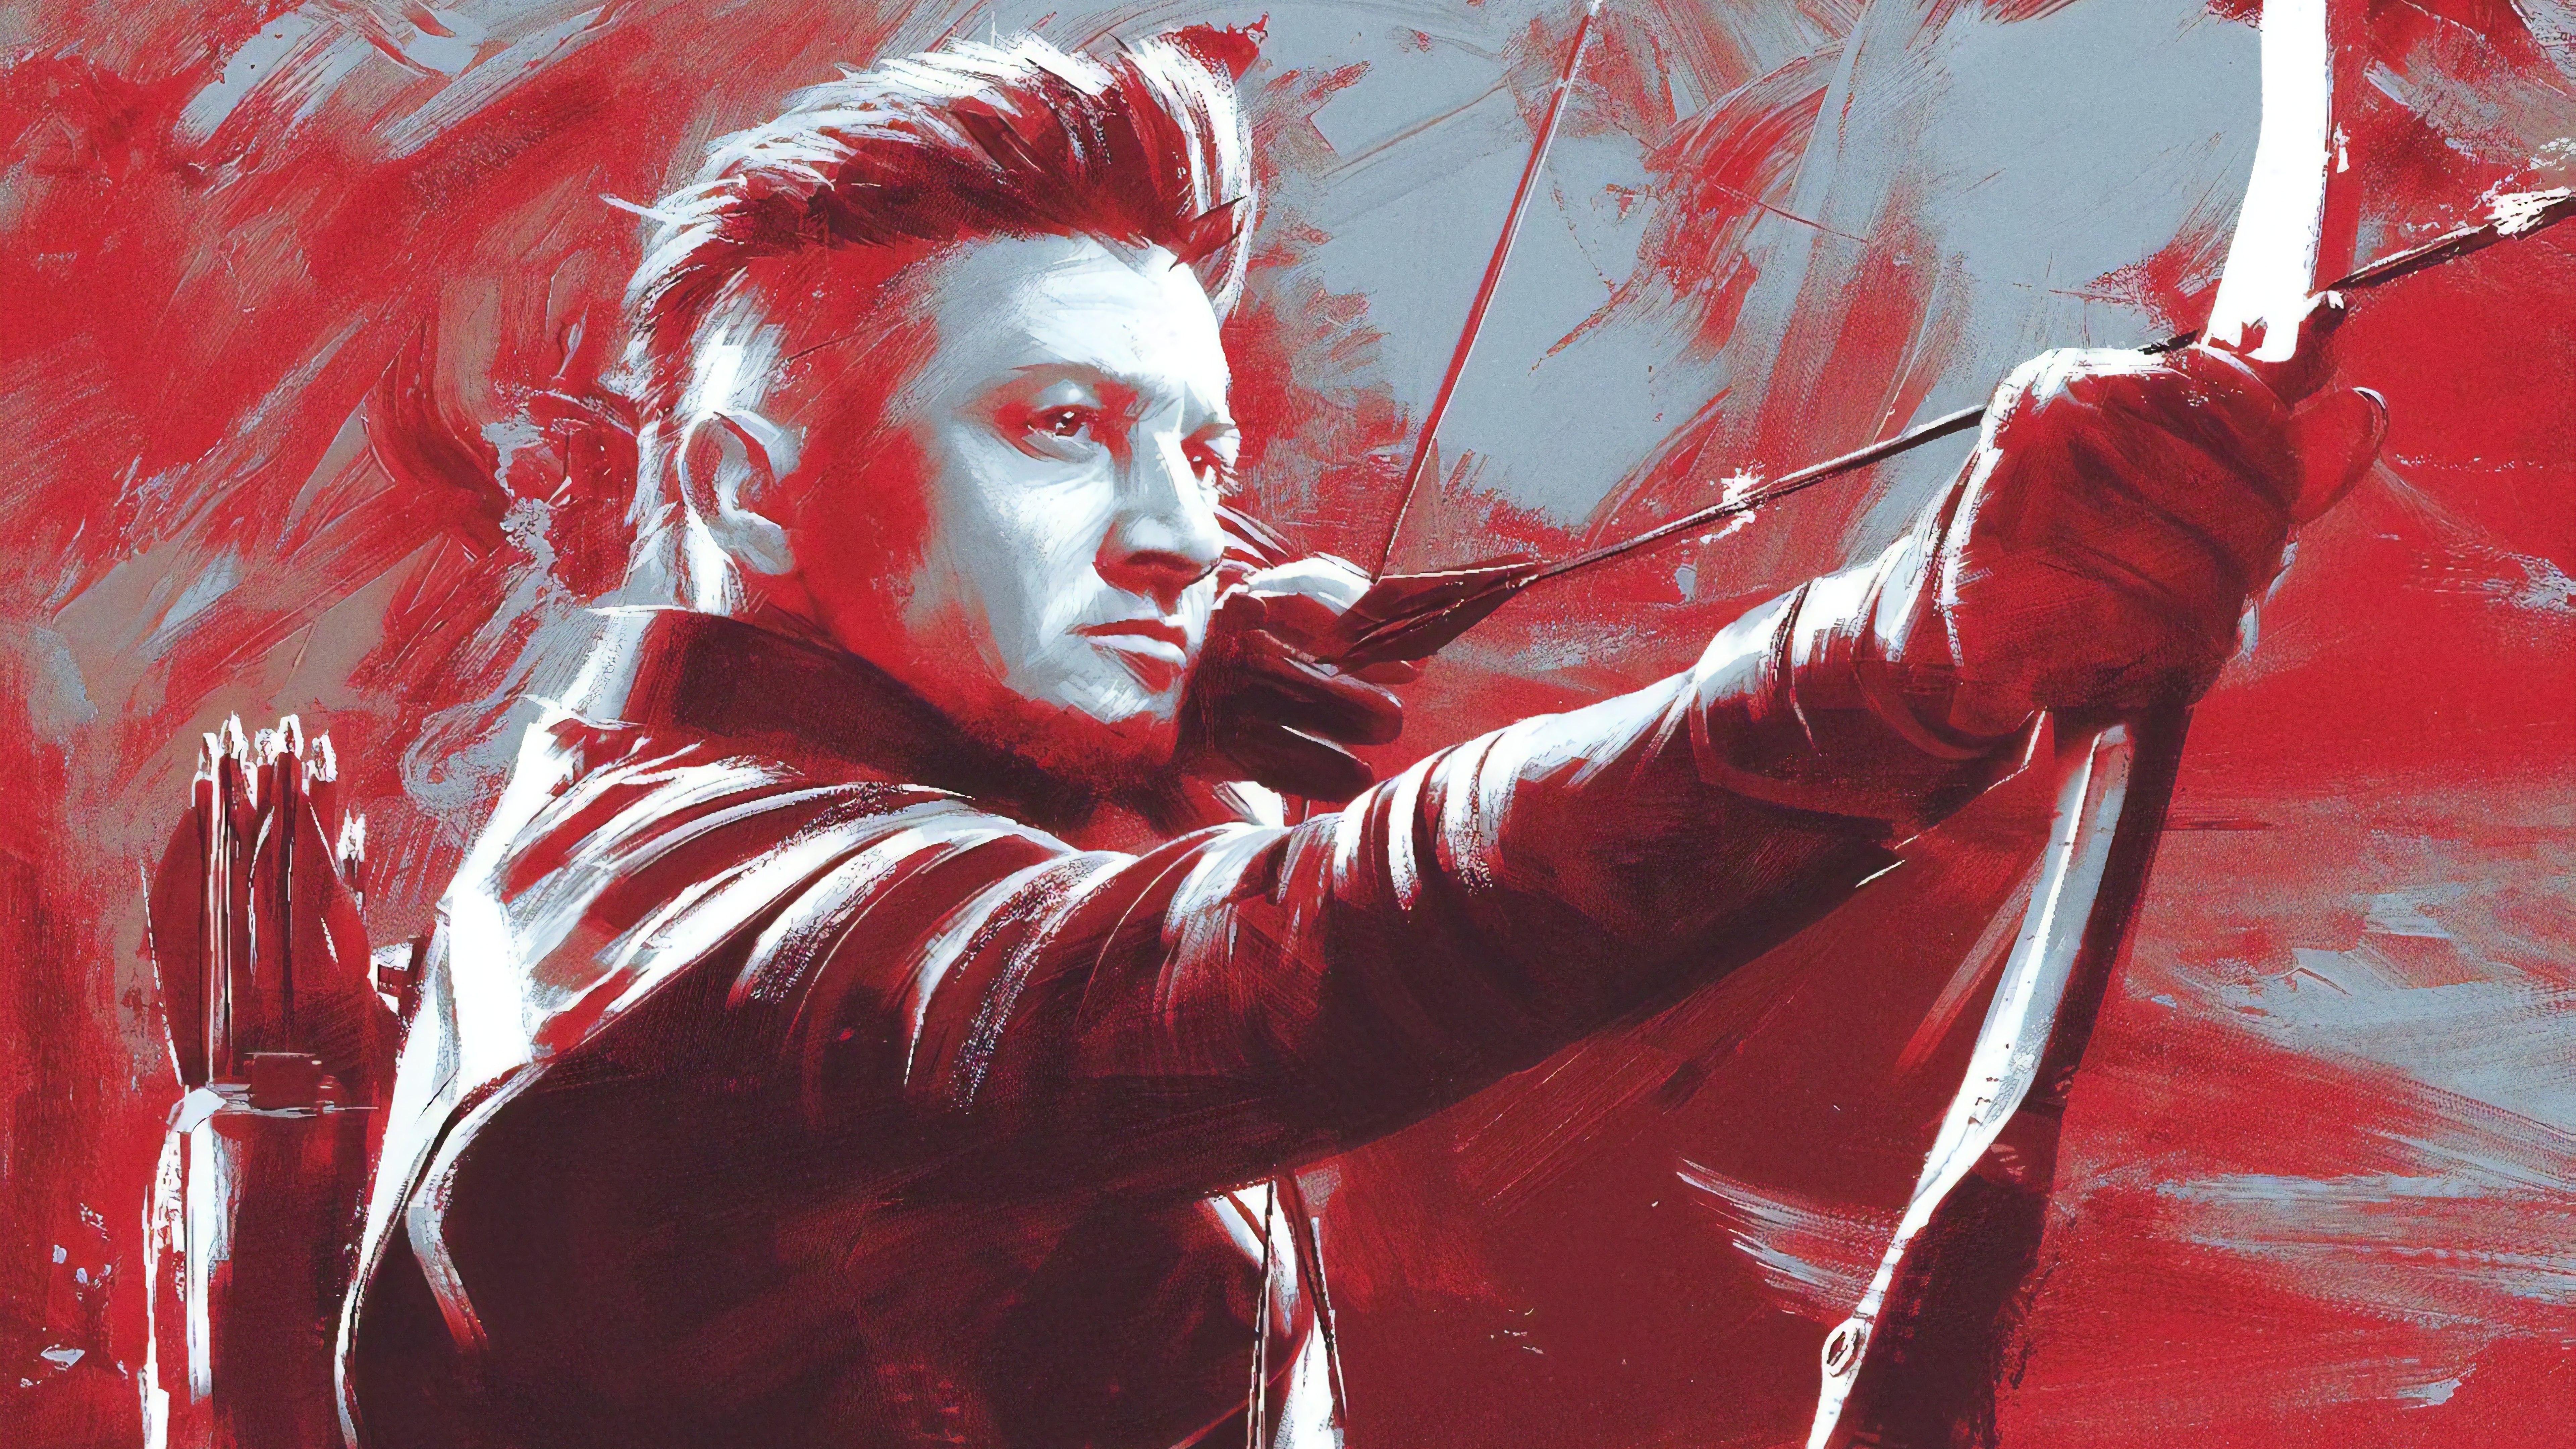 Avengers Endgame   Hawkeye 8k Ultra HD Wallpaper Background 7680x4320